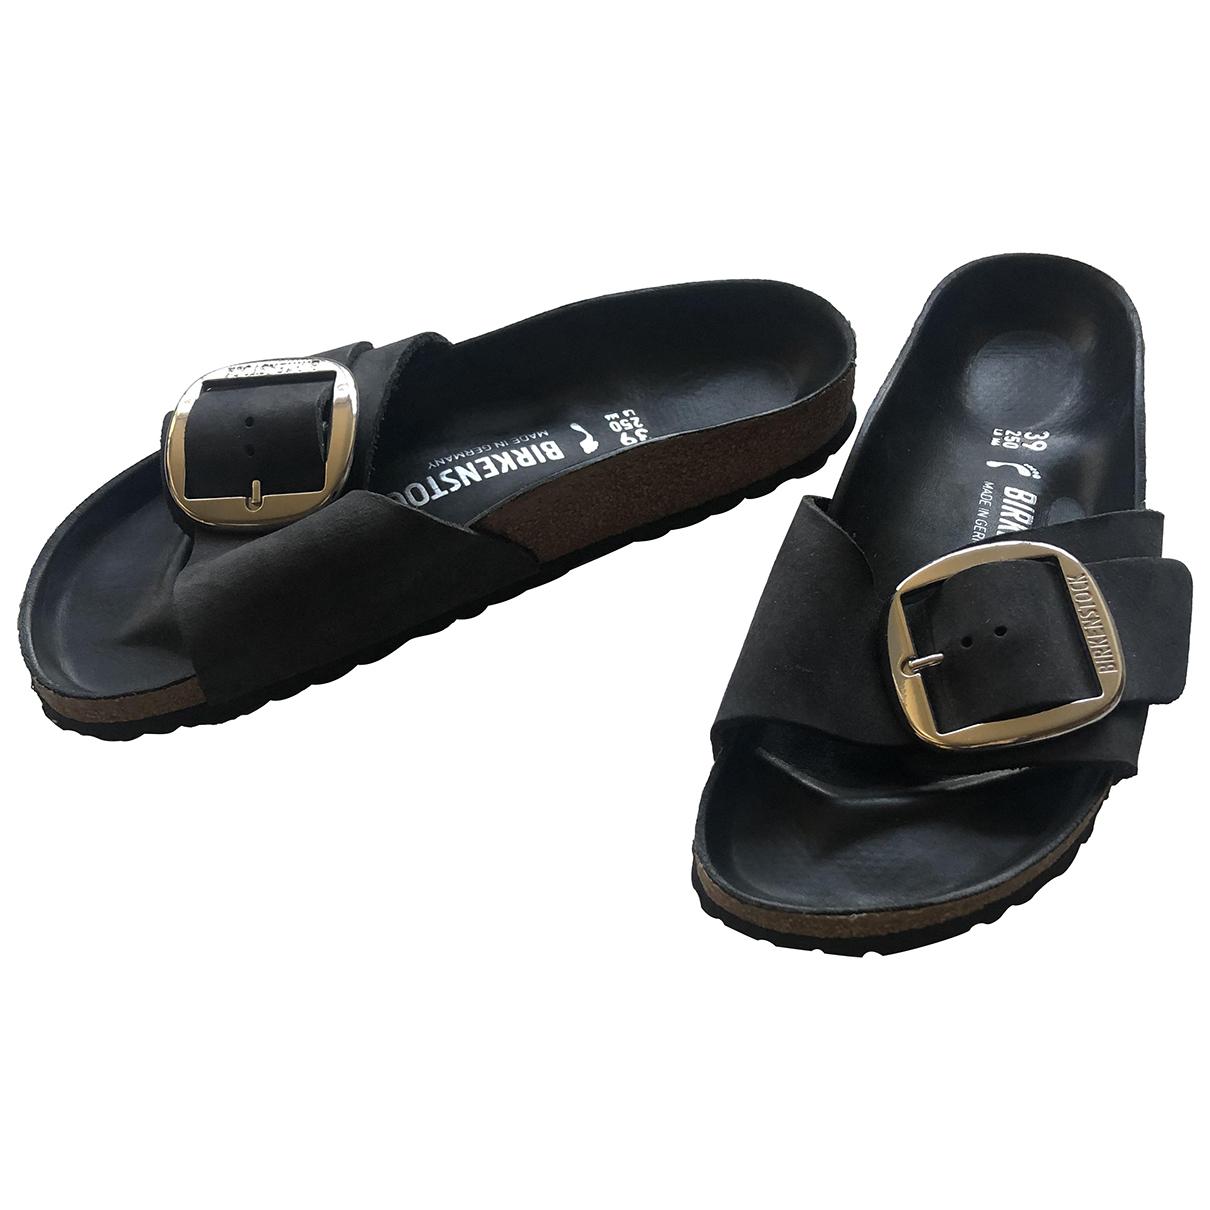 Birkenstock - Sandales   pour femme en suede - noir